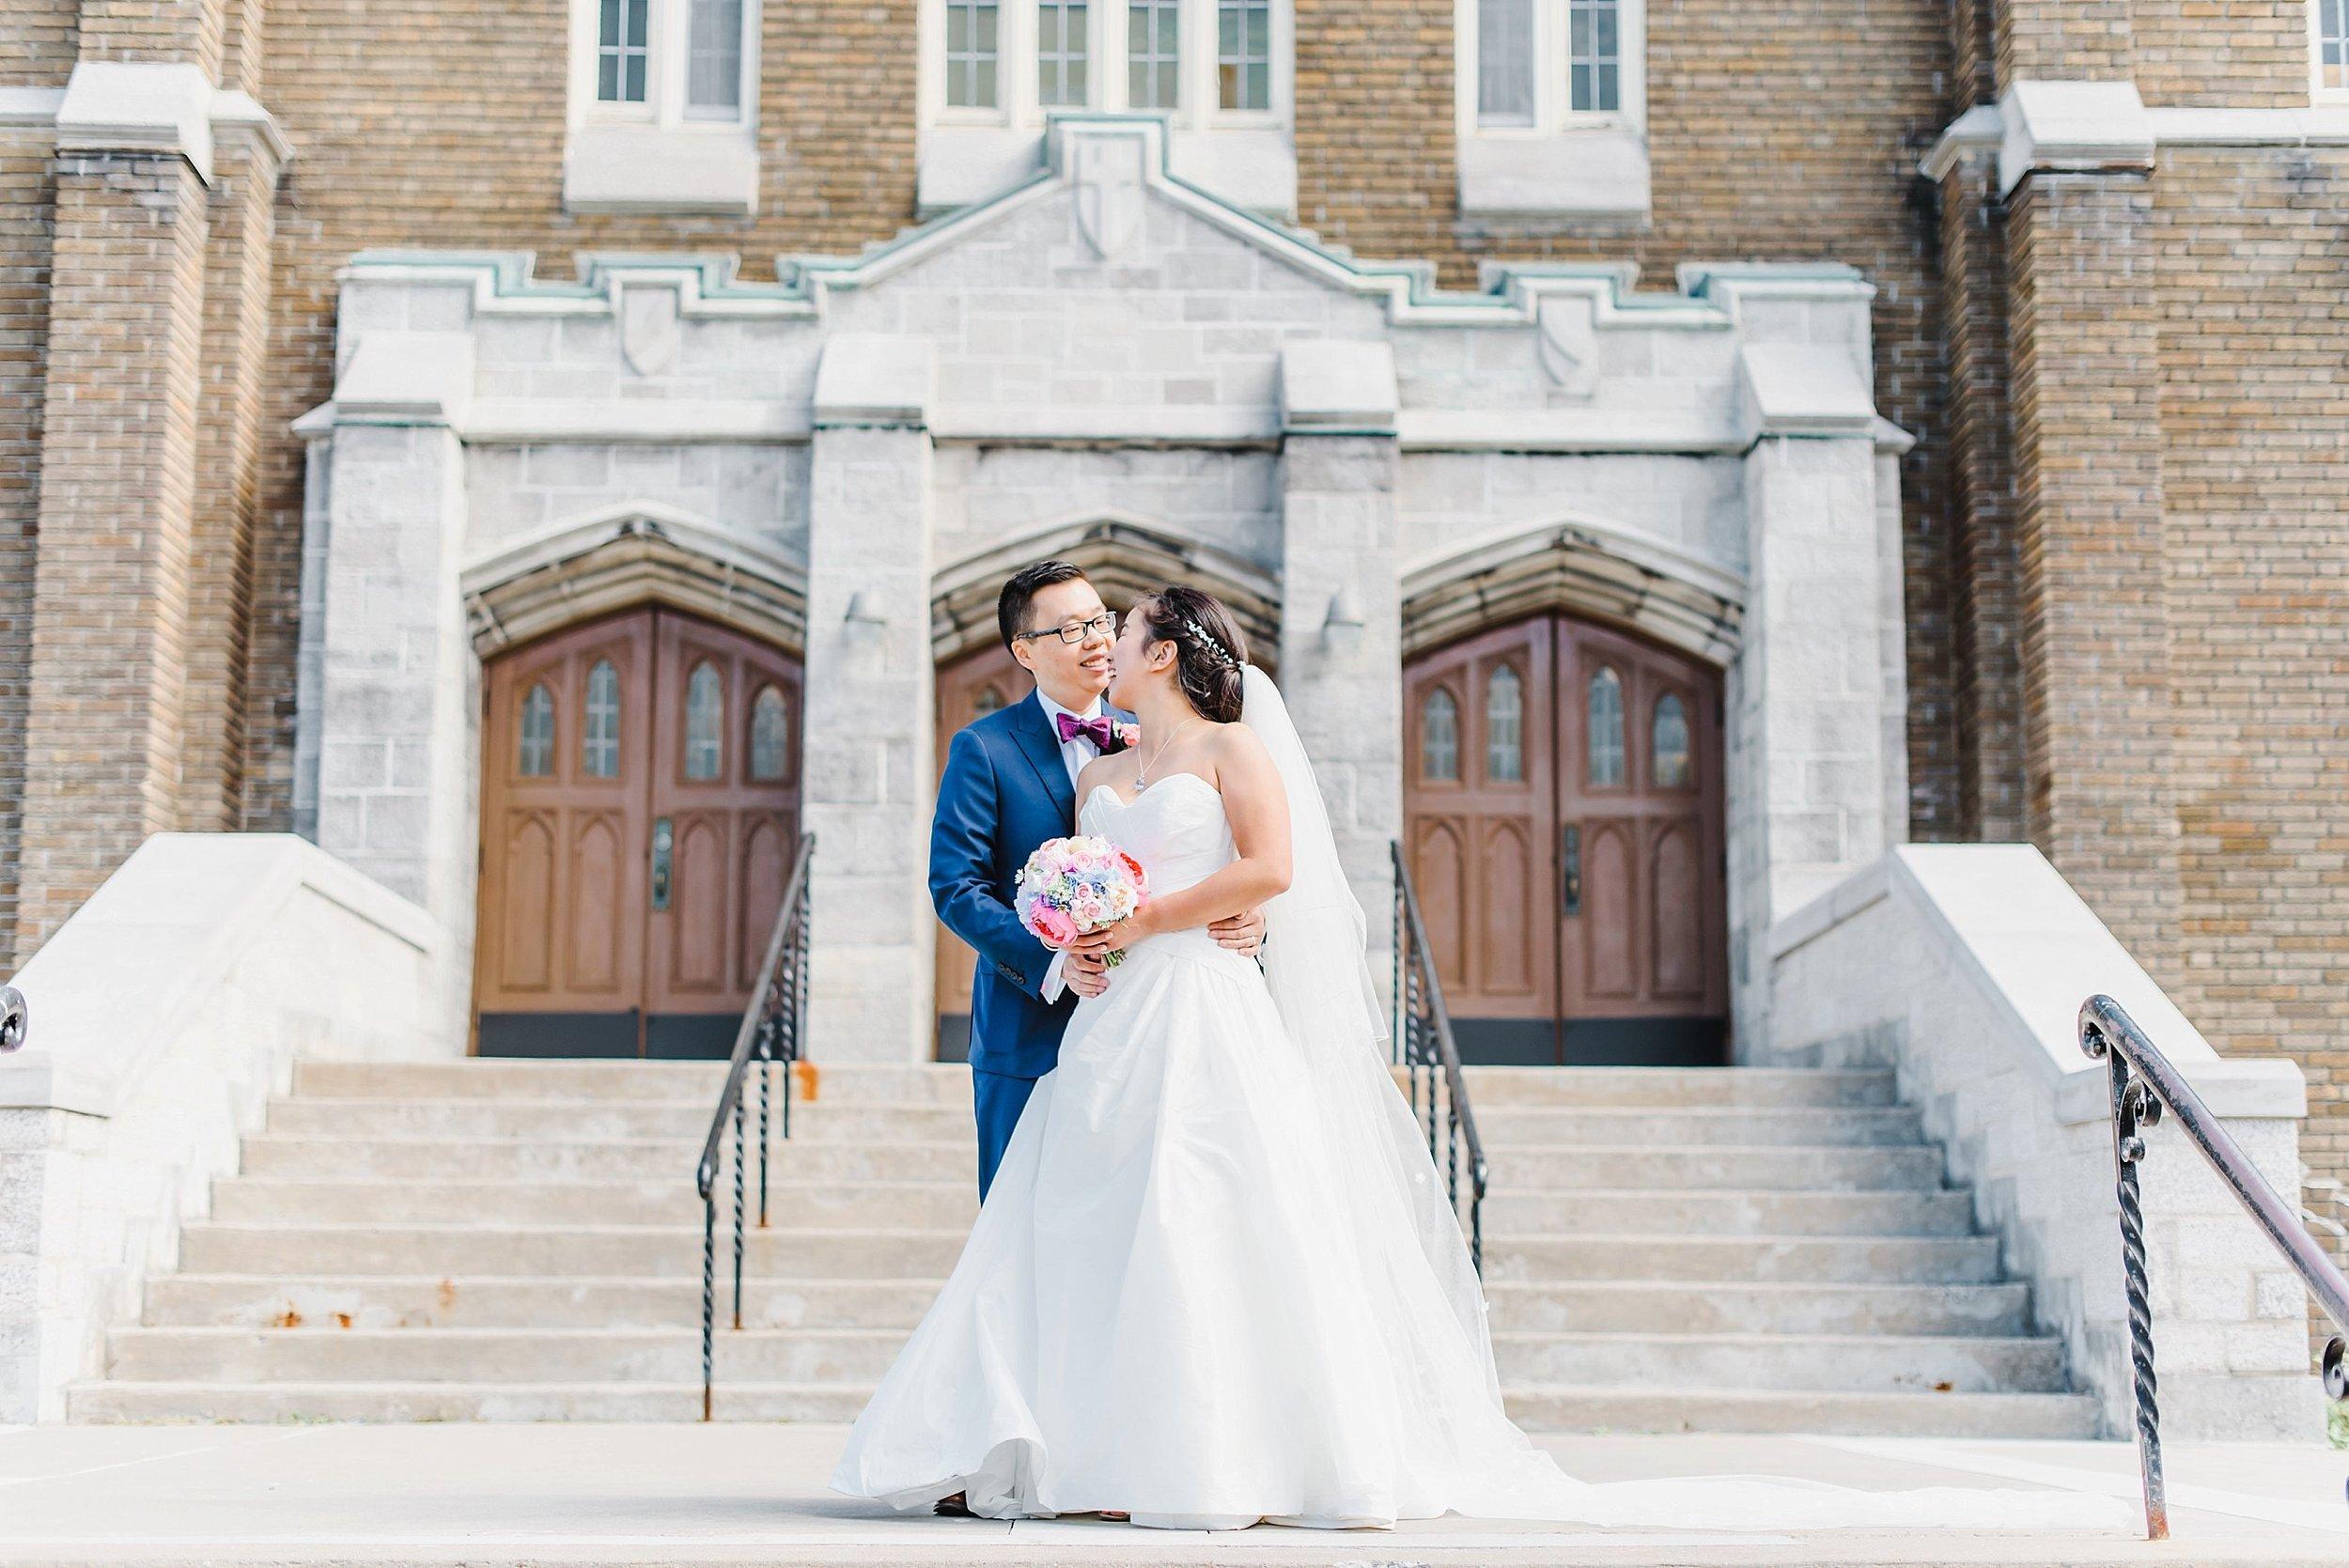 light airy indie fine art ottawa wedding photographer | Ali and Batoul Photography_1493.jpg